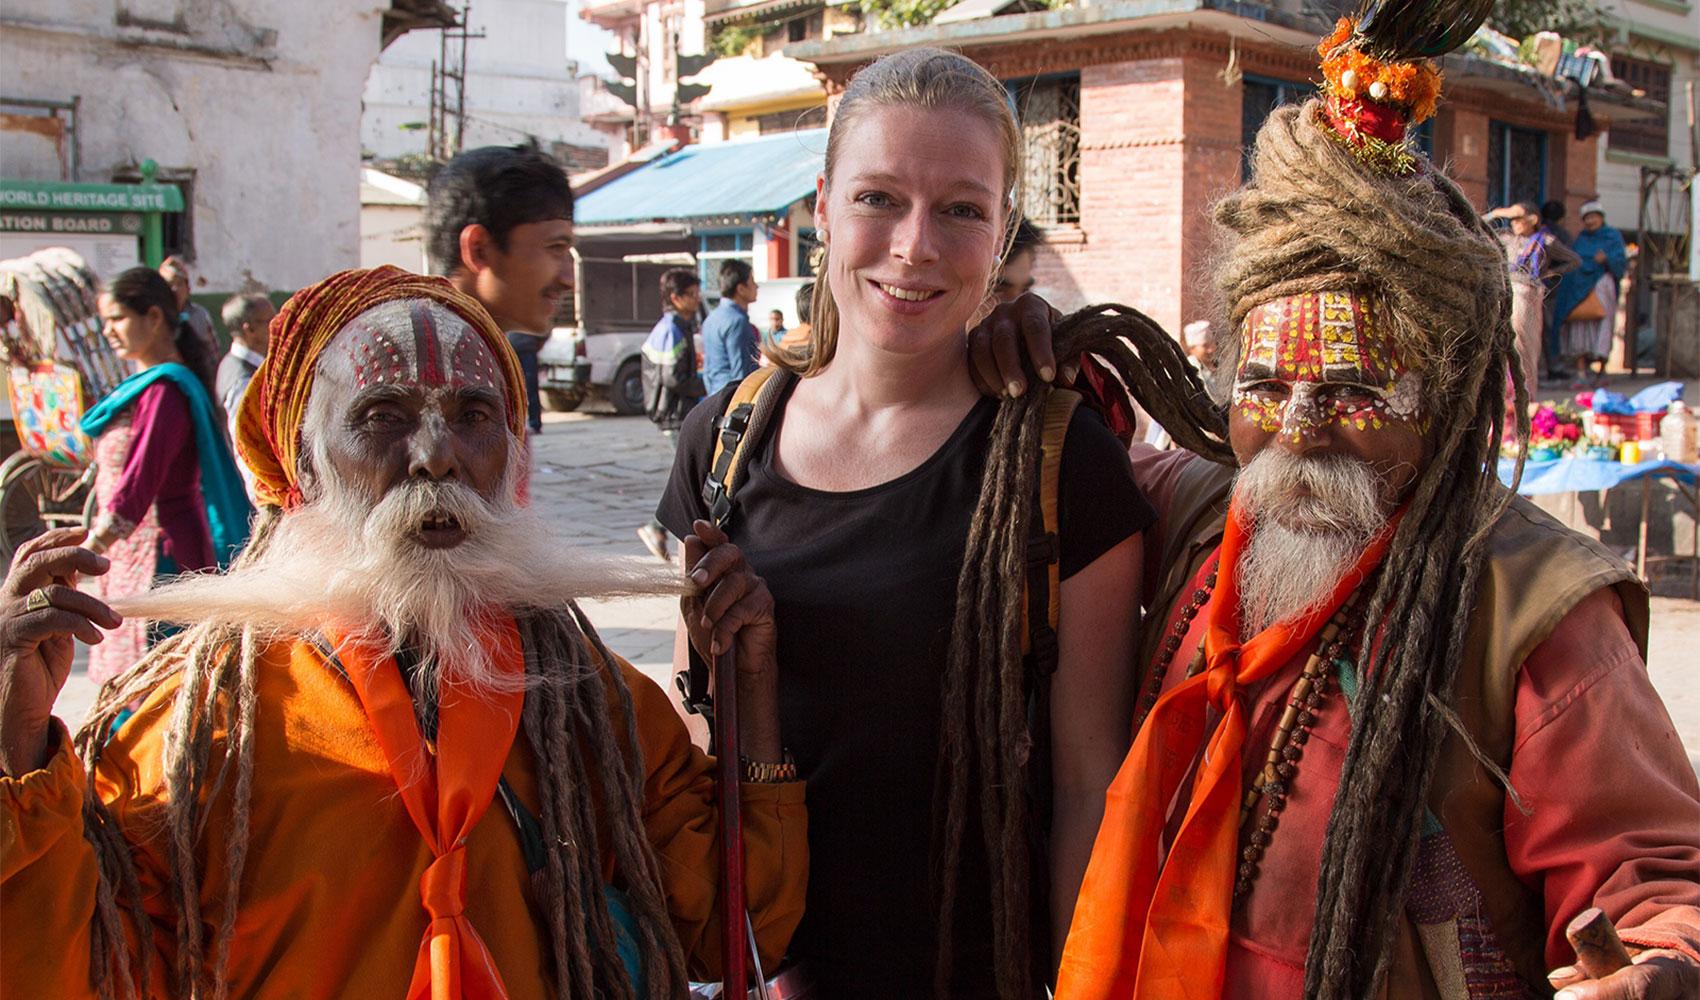 reisspecialist kim | rama tours holland hoofdfoto